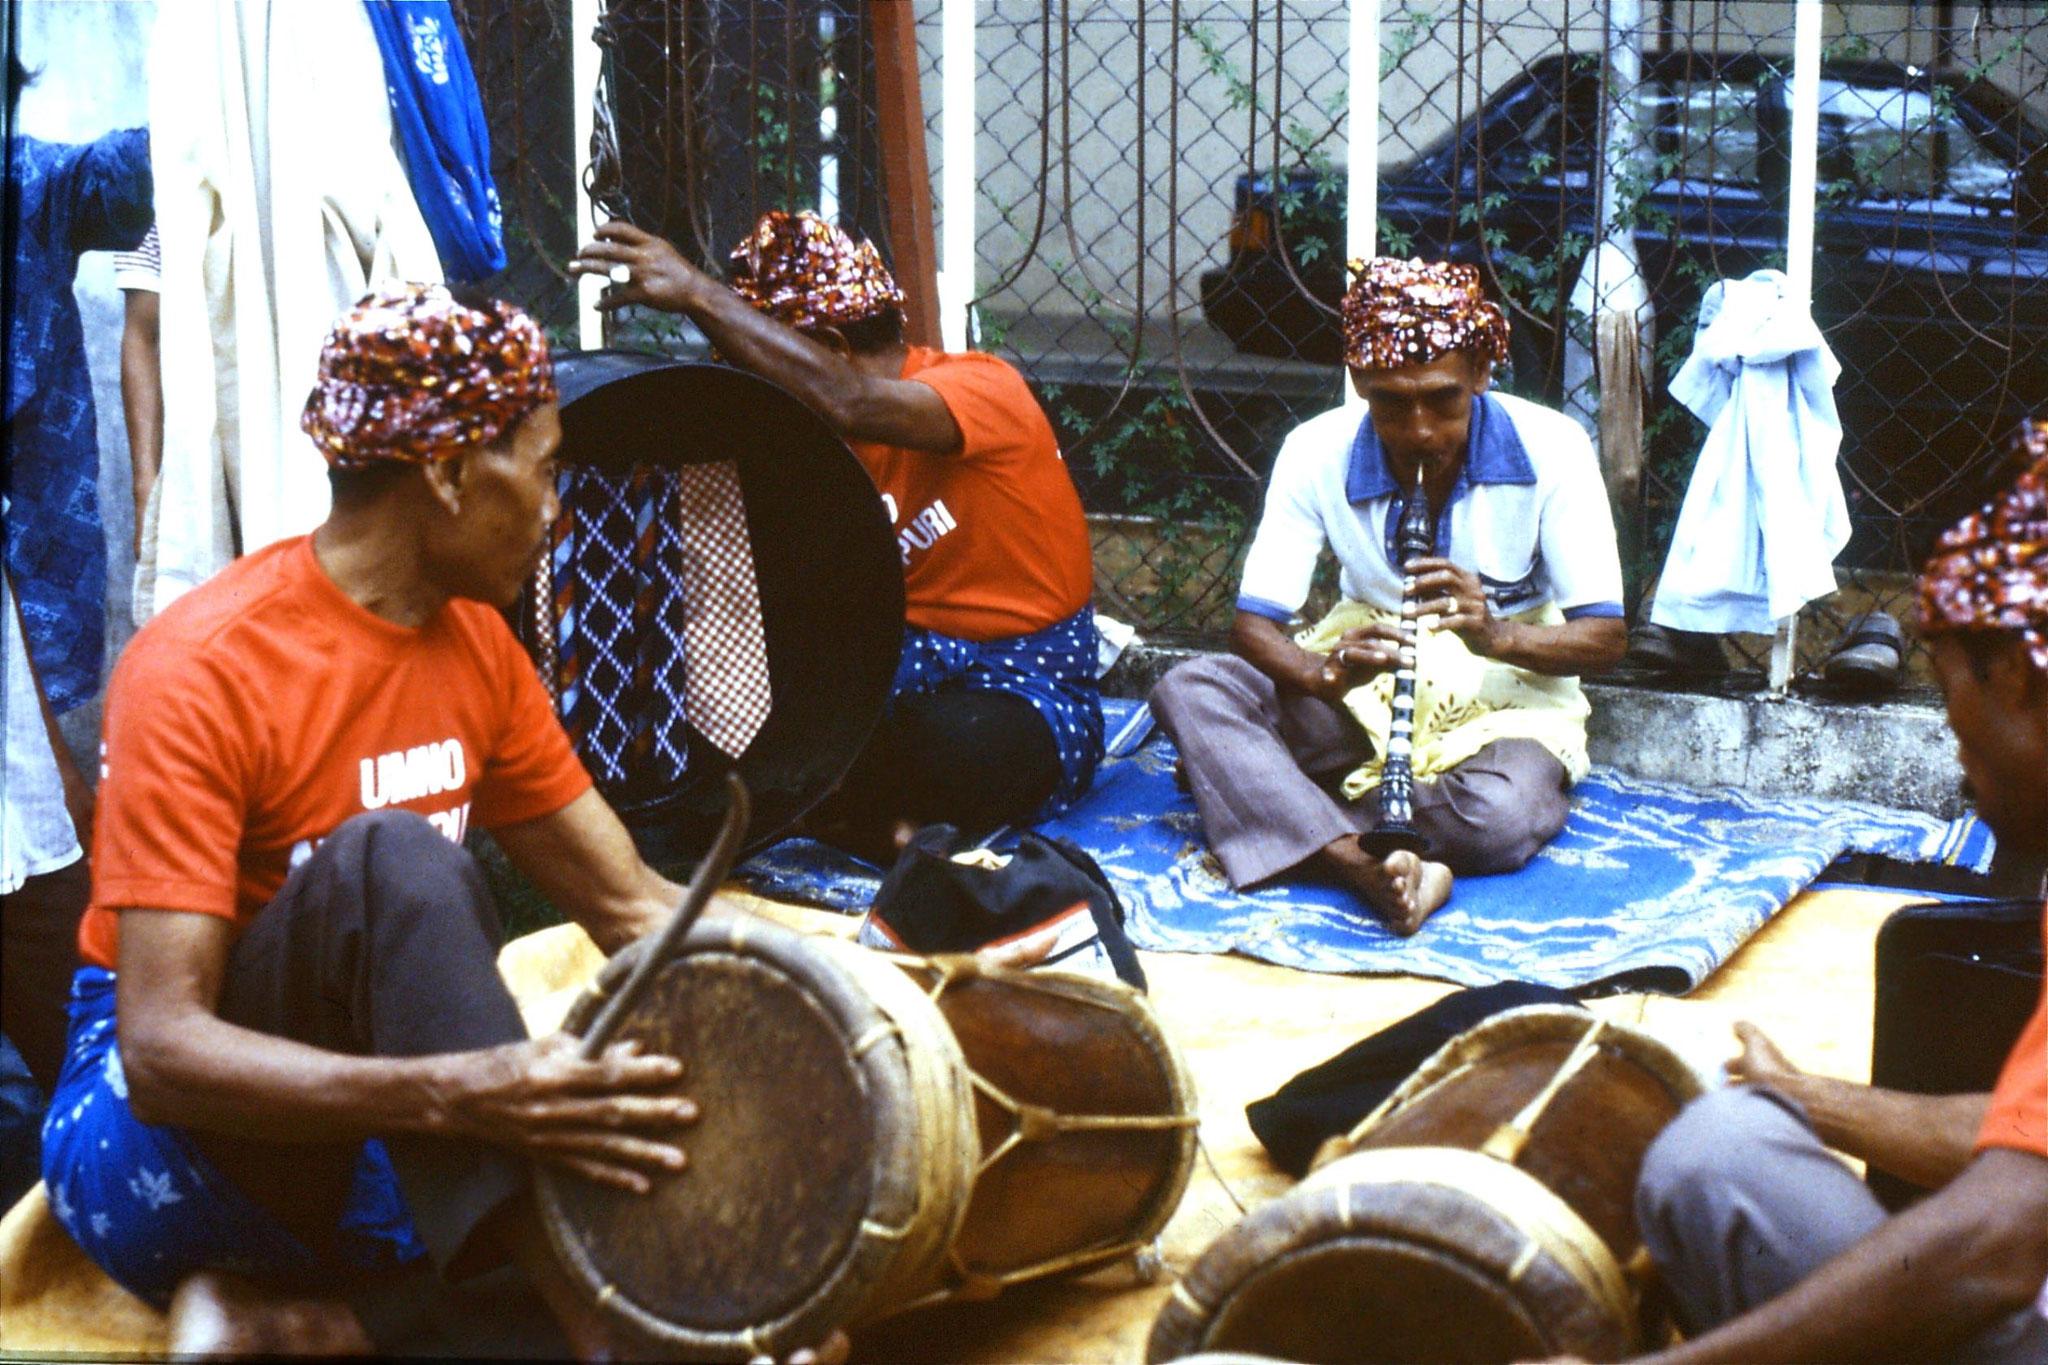 20/6/1990: 21: Kota Bharu cultural show